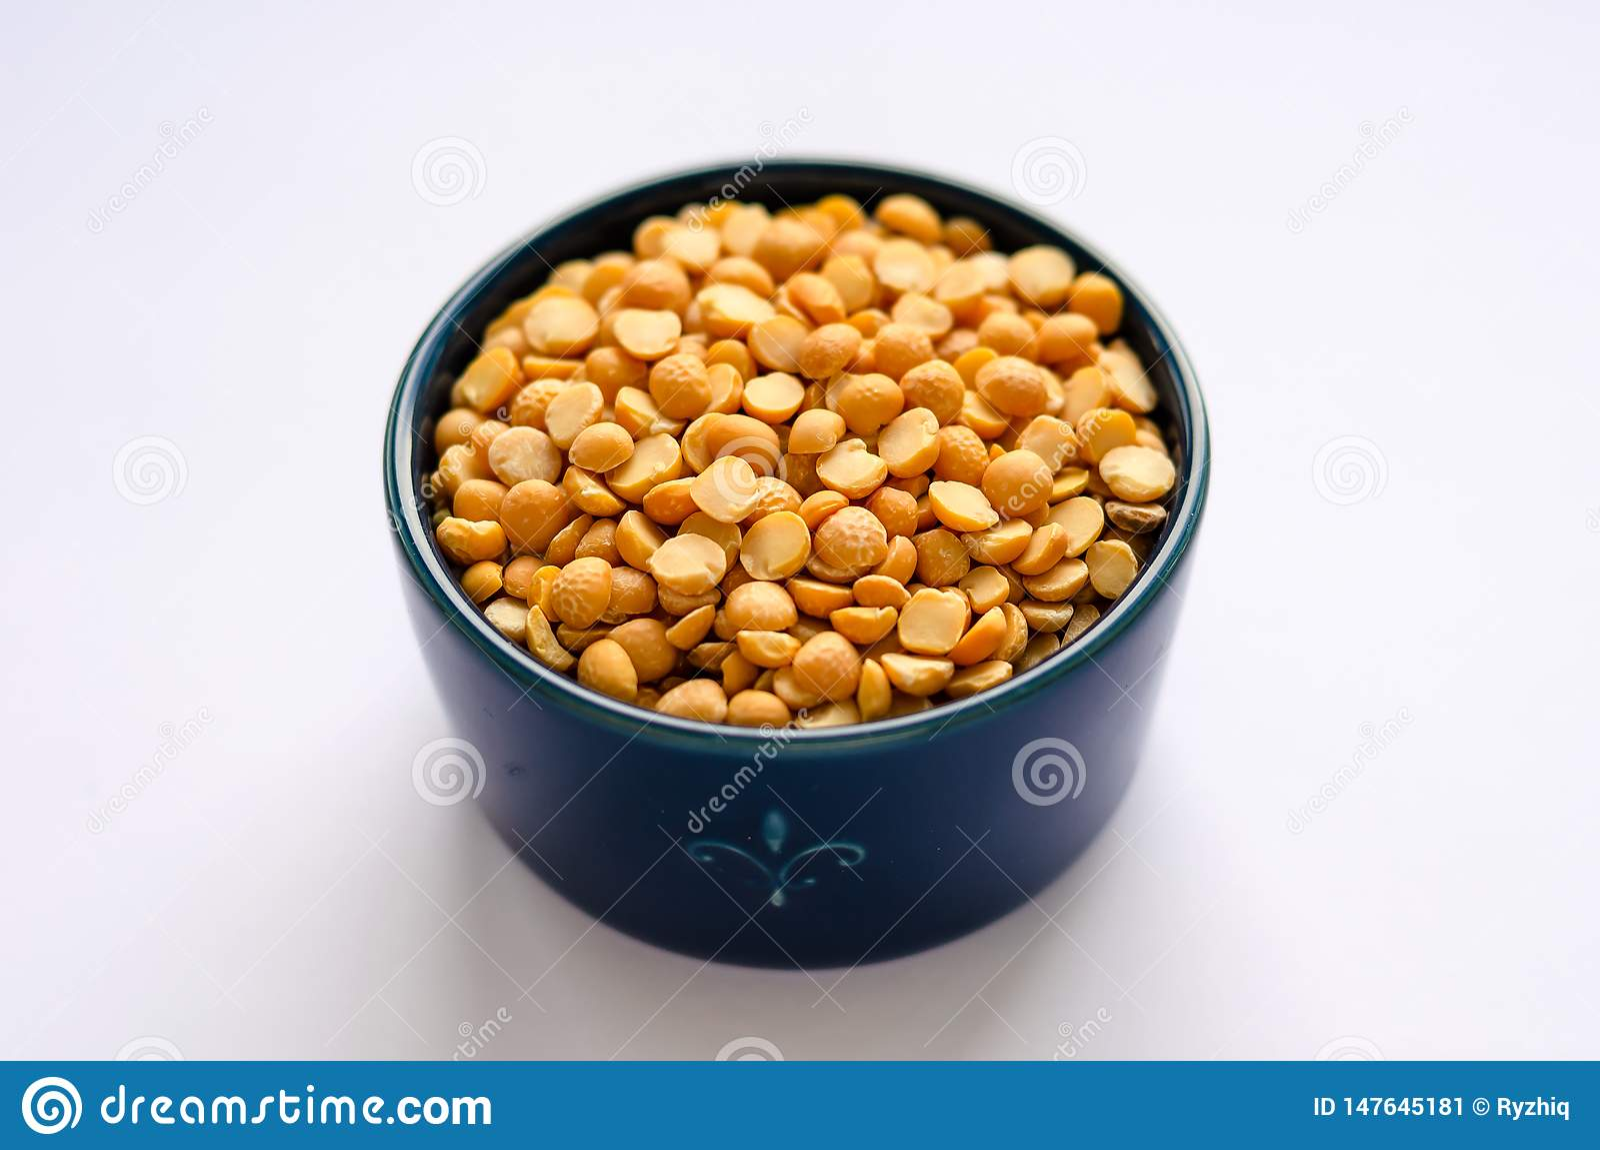 Bowl of yellow dried split peas on white background